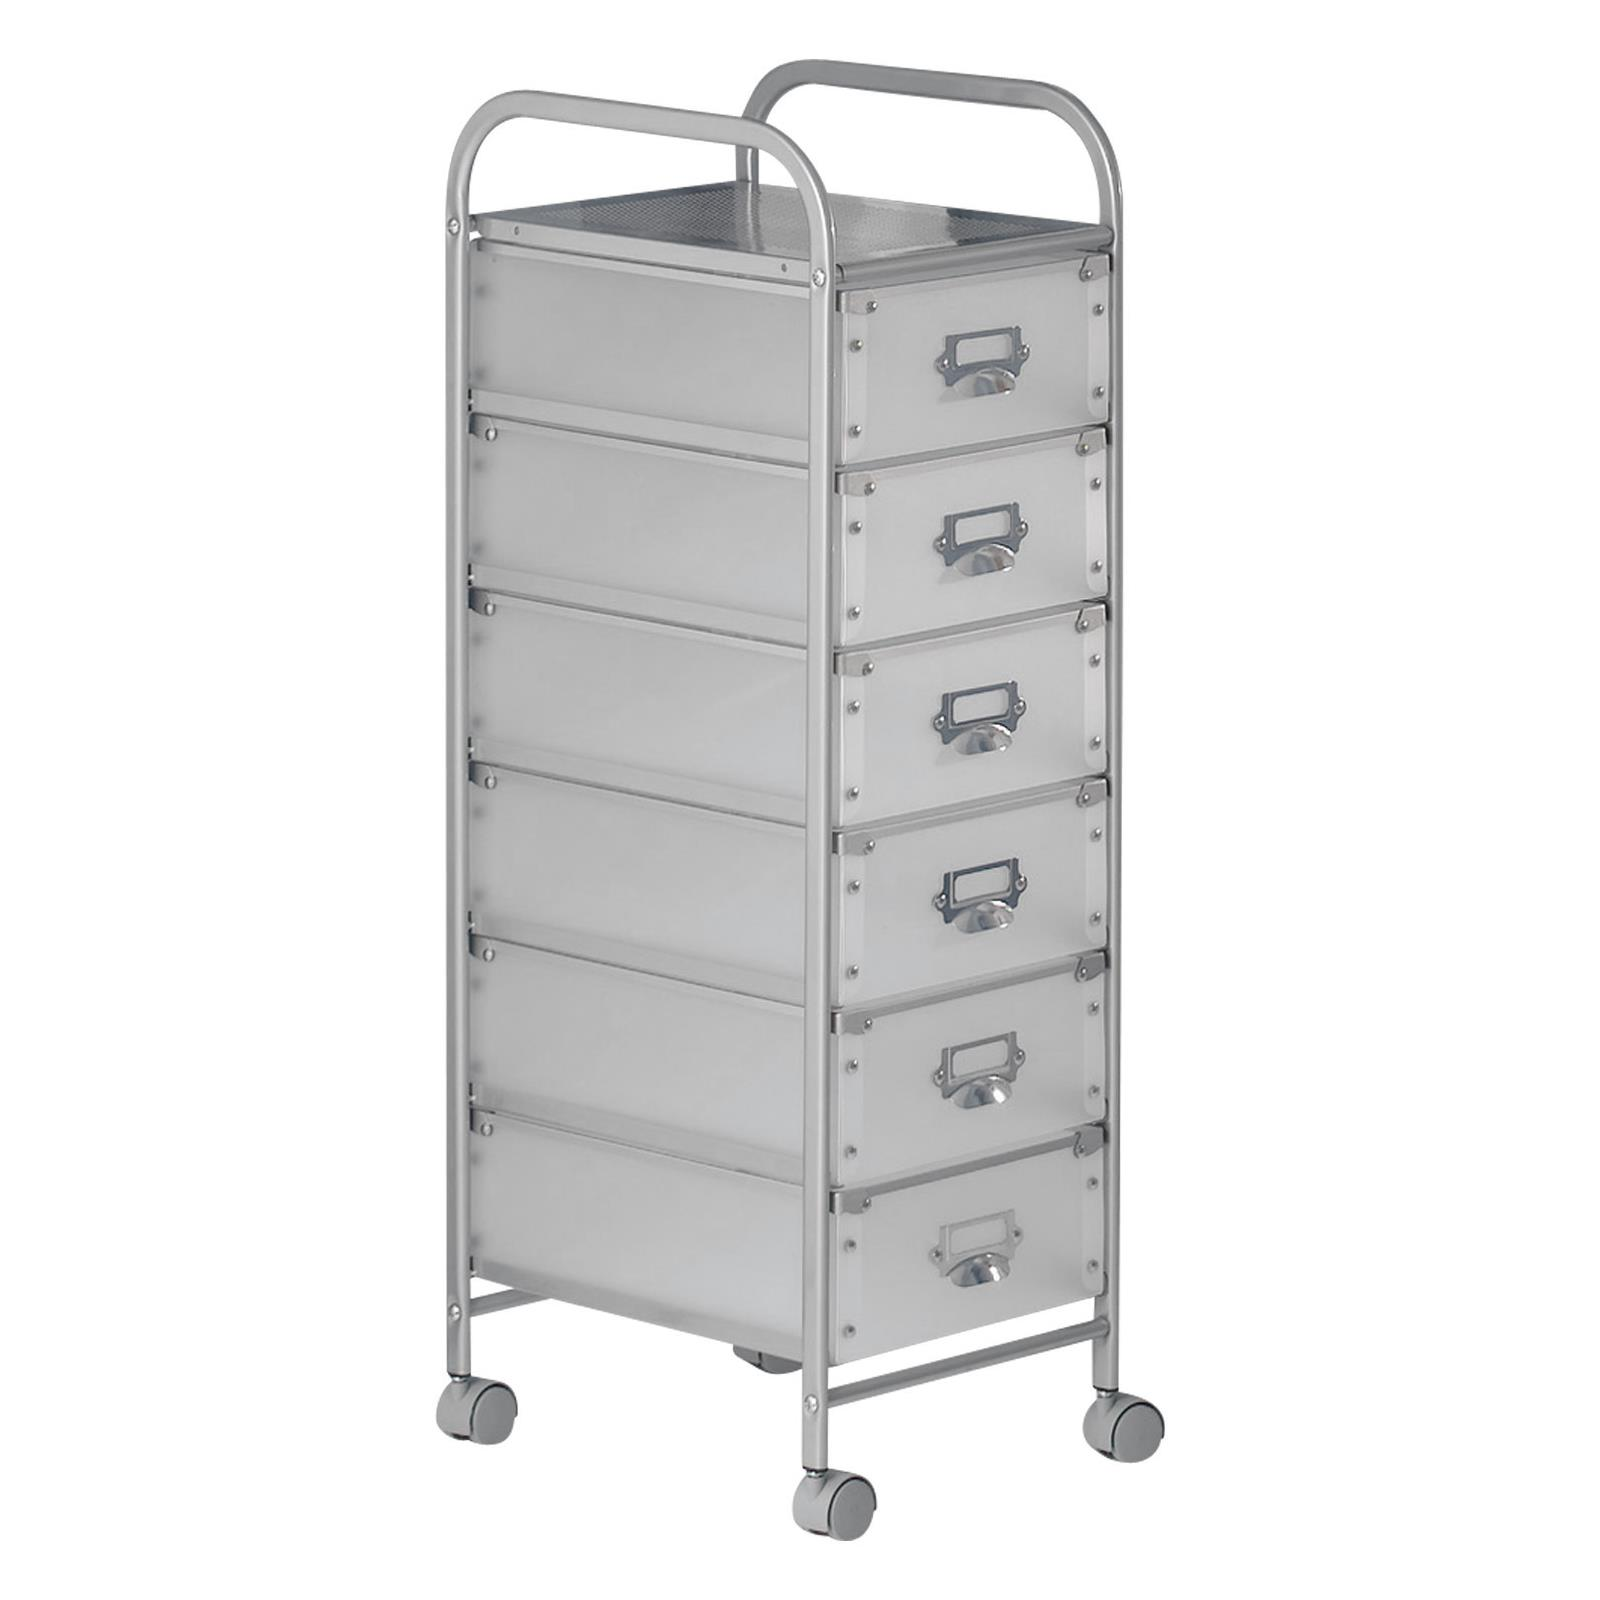 caisson sur roulette roli 1 6 tiroirs aluminium. Black Bedroom Furniture Sets. Home Design Ideas